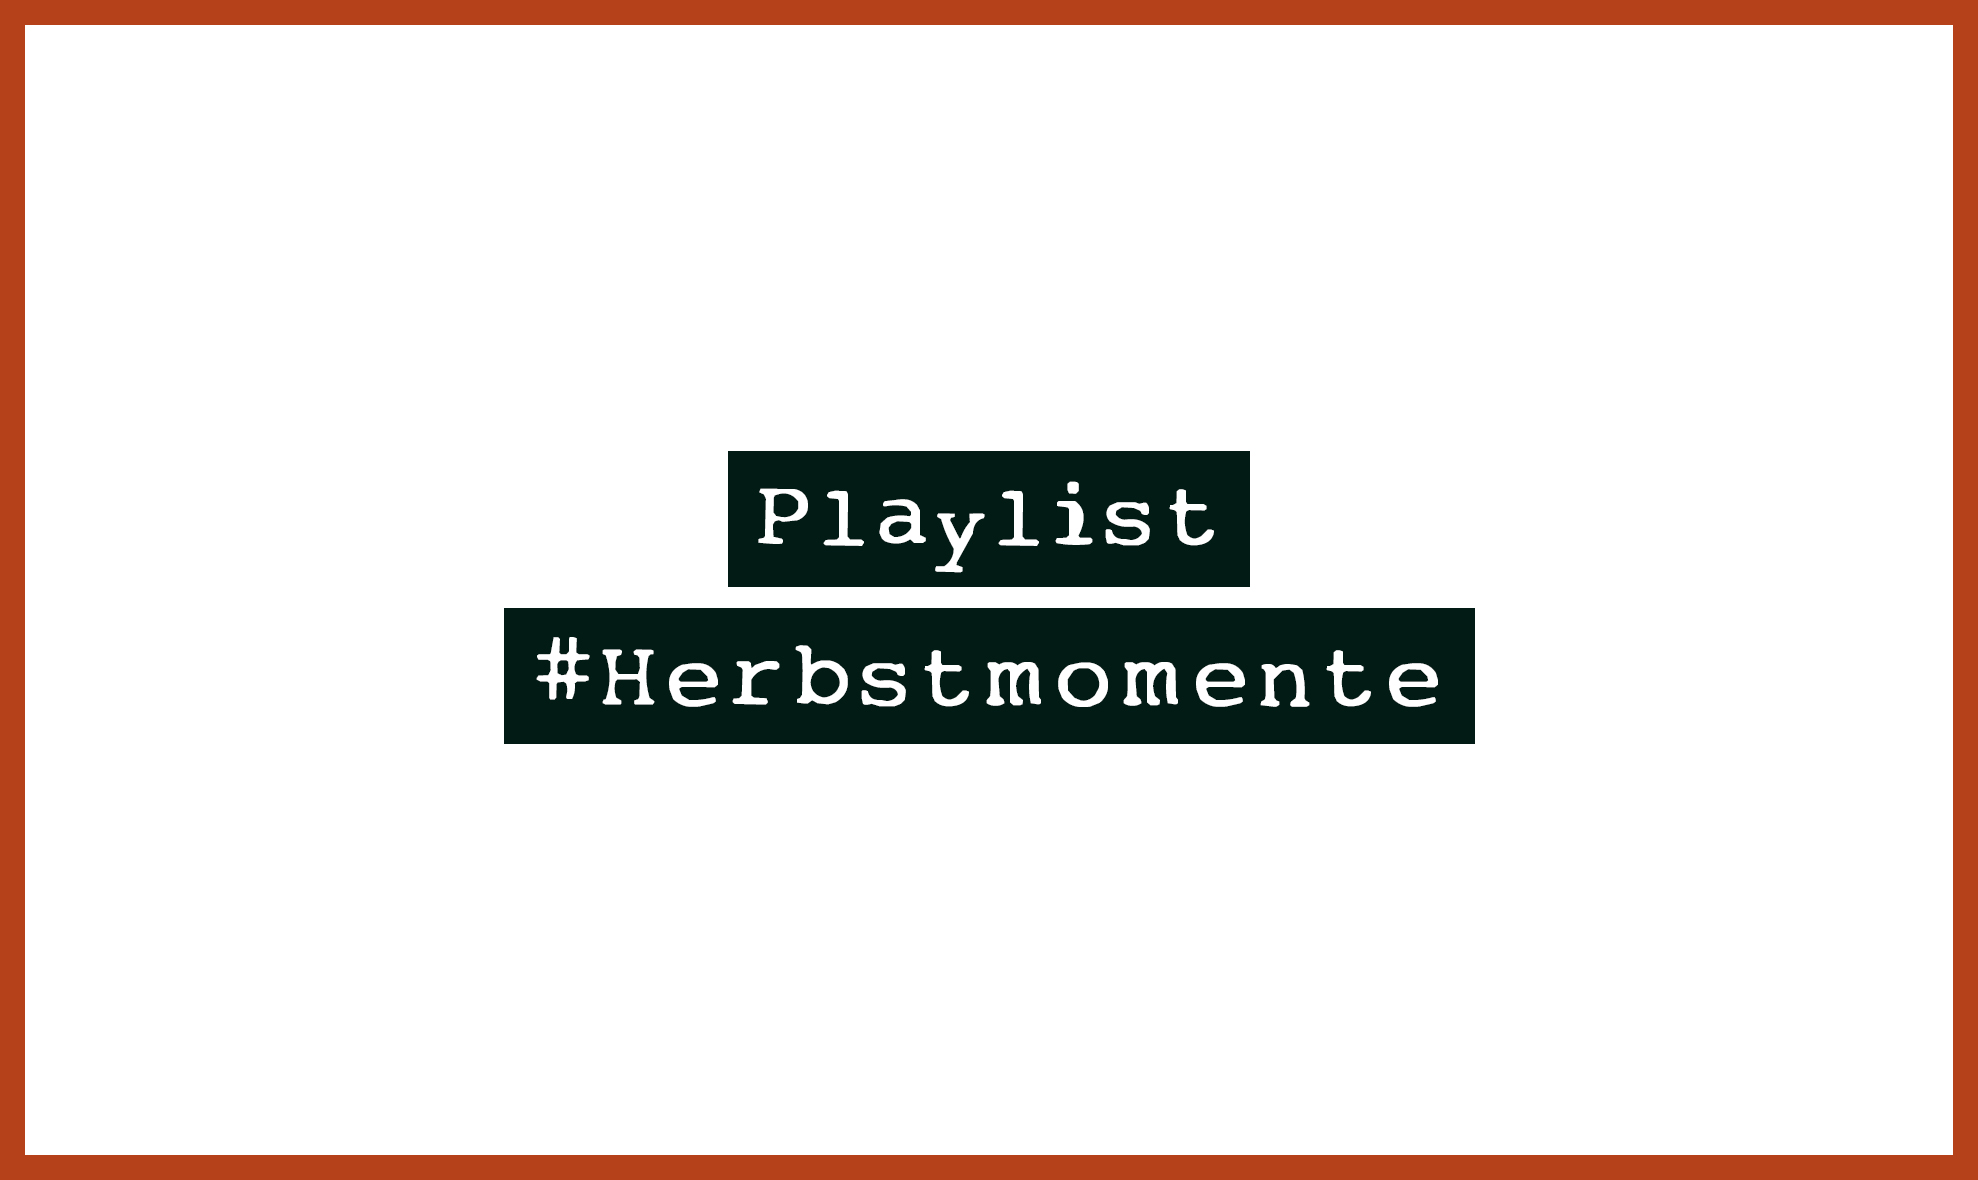 Playlist #Herbstmomente